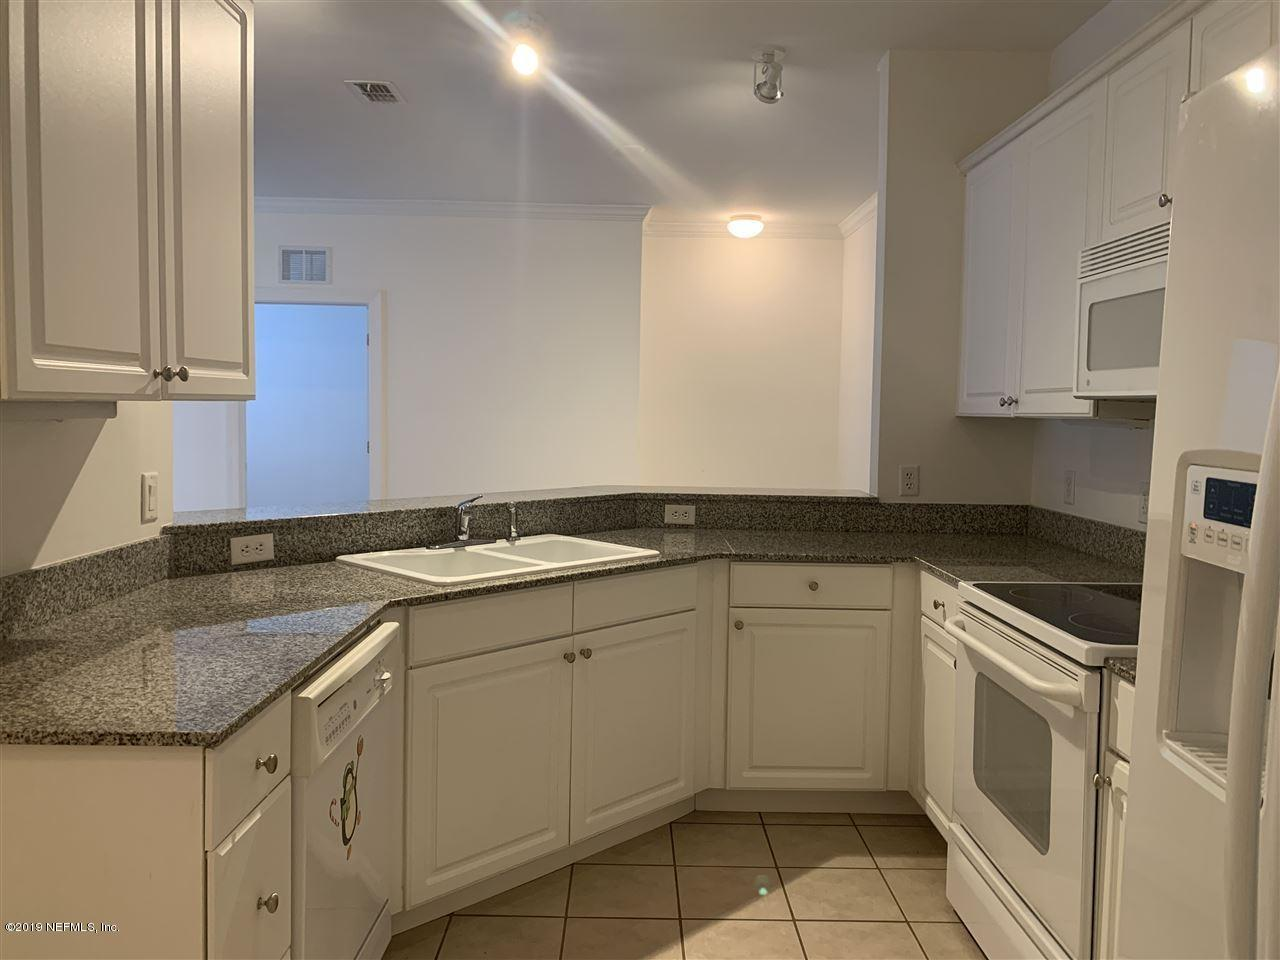 315 RYDER CUP, ST AUGUSTINE, FLORIDA 32092, 2 Bedrooms Bedrooms, ,2 BathroomsBathrooms,Condo,For sale,RYDER CUP,1015665